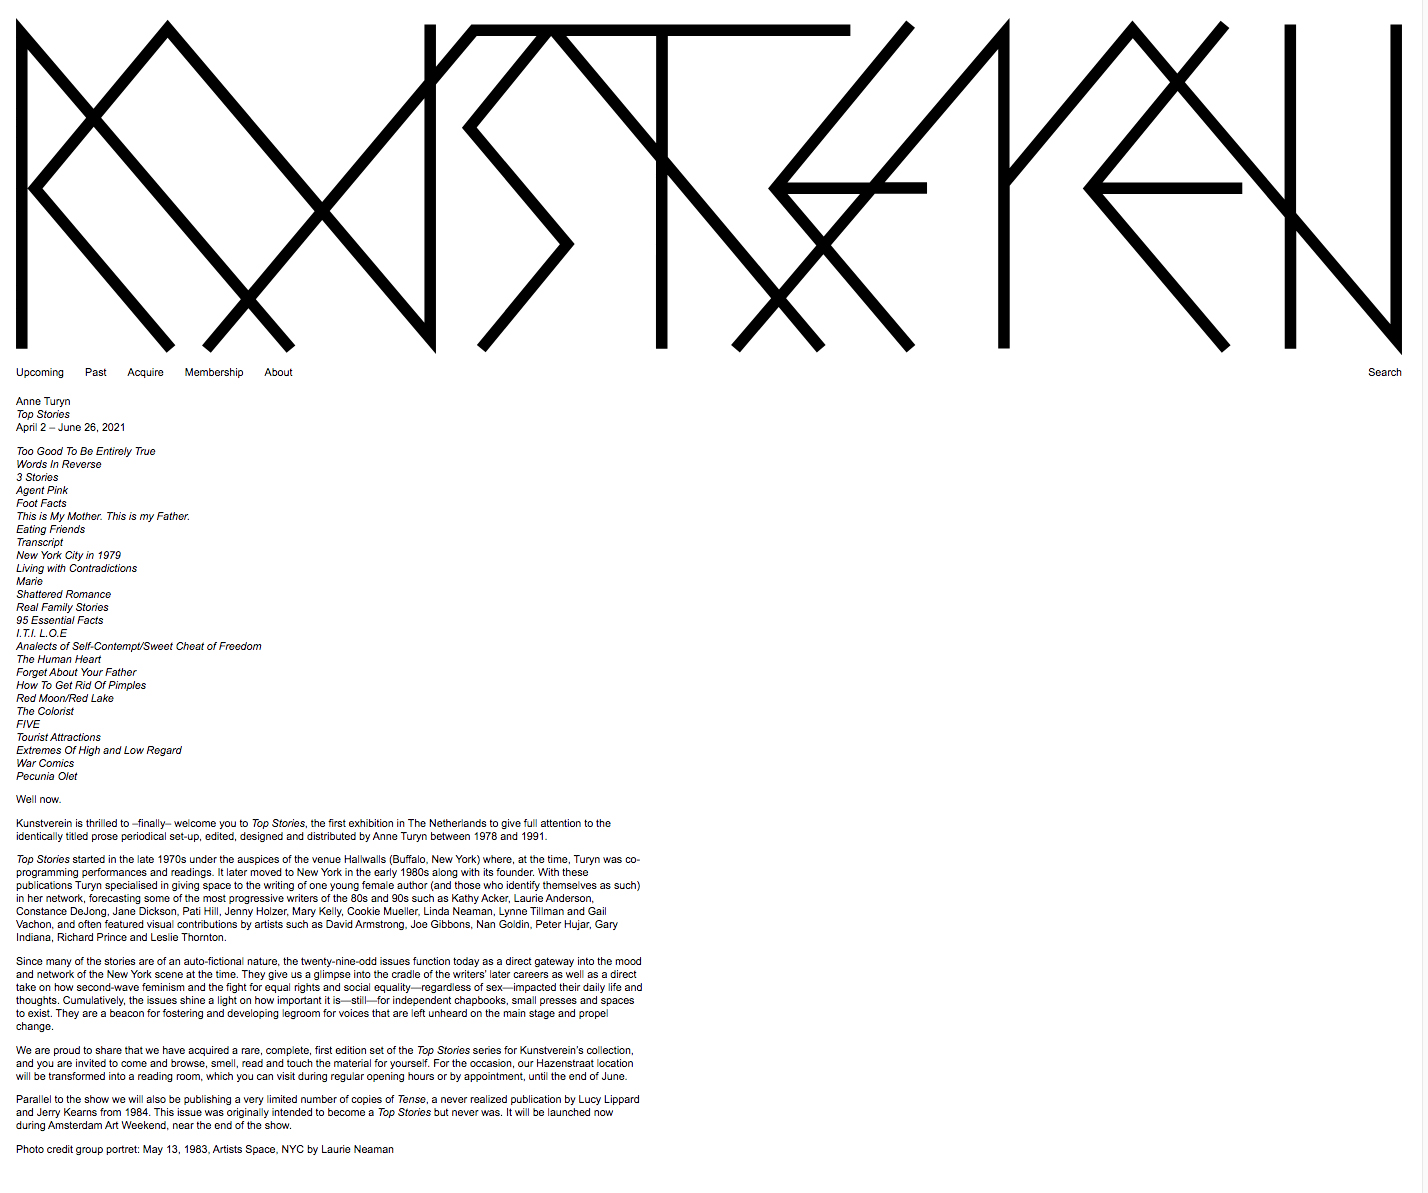 Kunstverein.nlAmsterdamApril 2, 2021-June 26, 2021